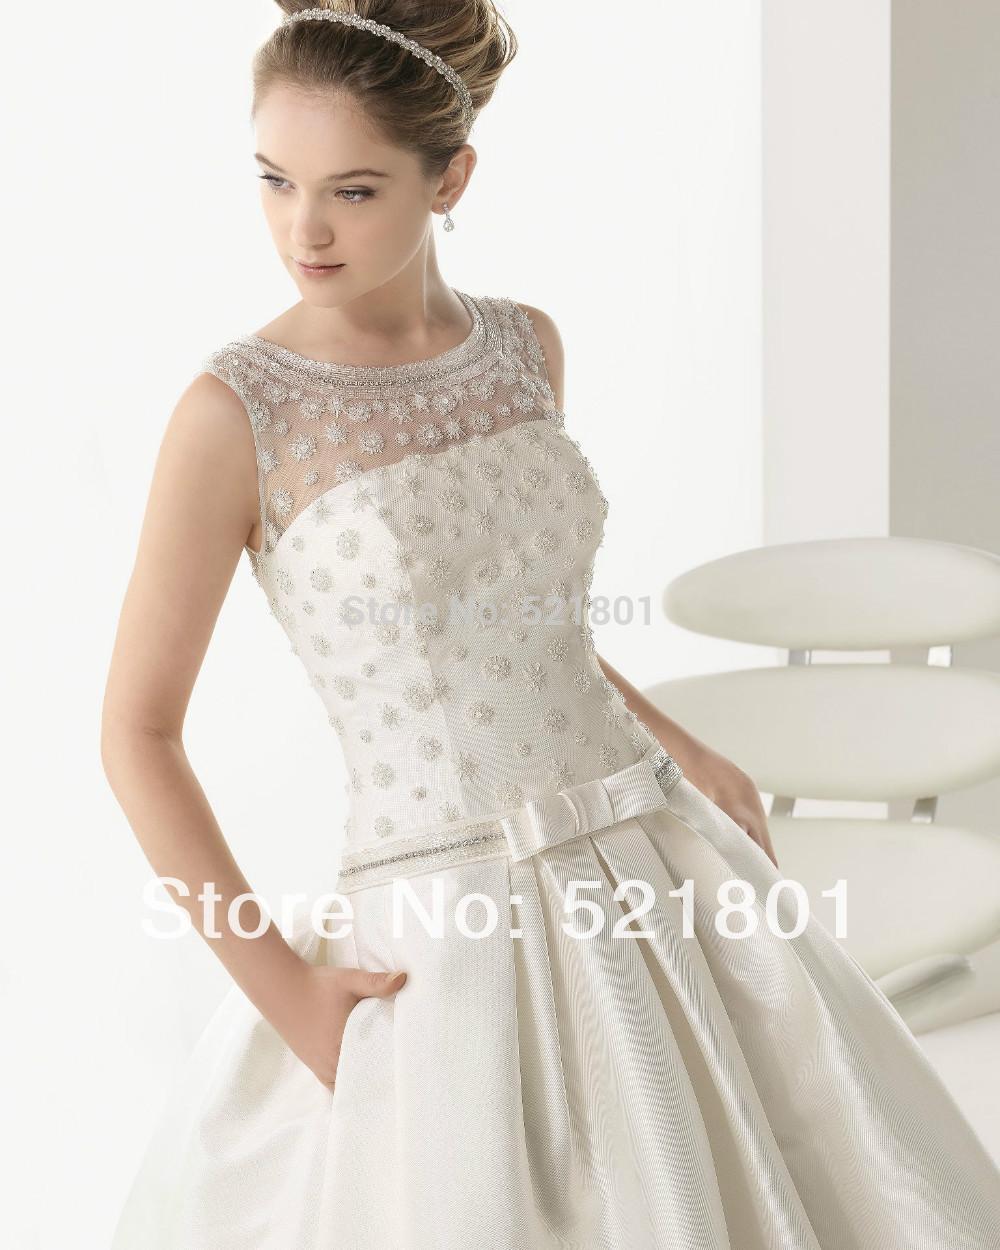 Luxury Dress Code Doll Collar Shiffon Summer One Piece Dress Pregnant Dress